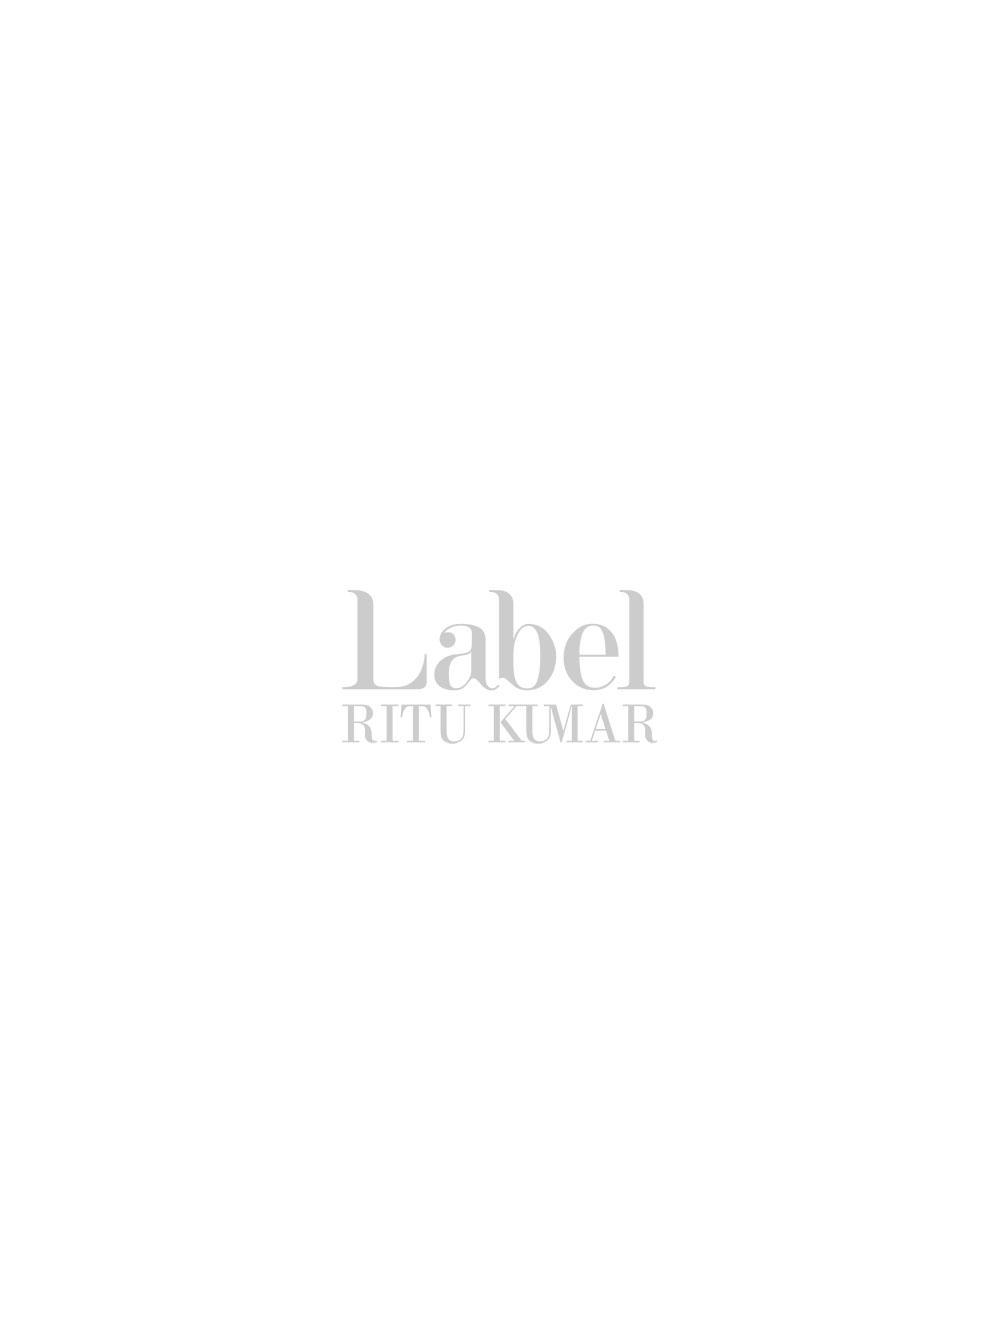 Black Off Shoulder Top By Label Ritu Kumar